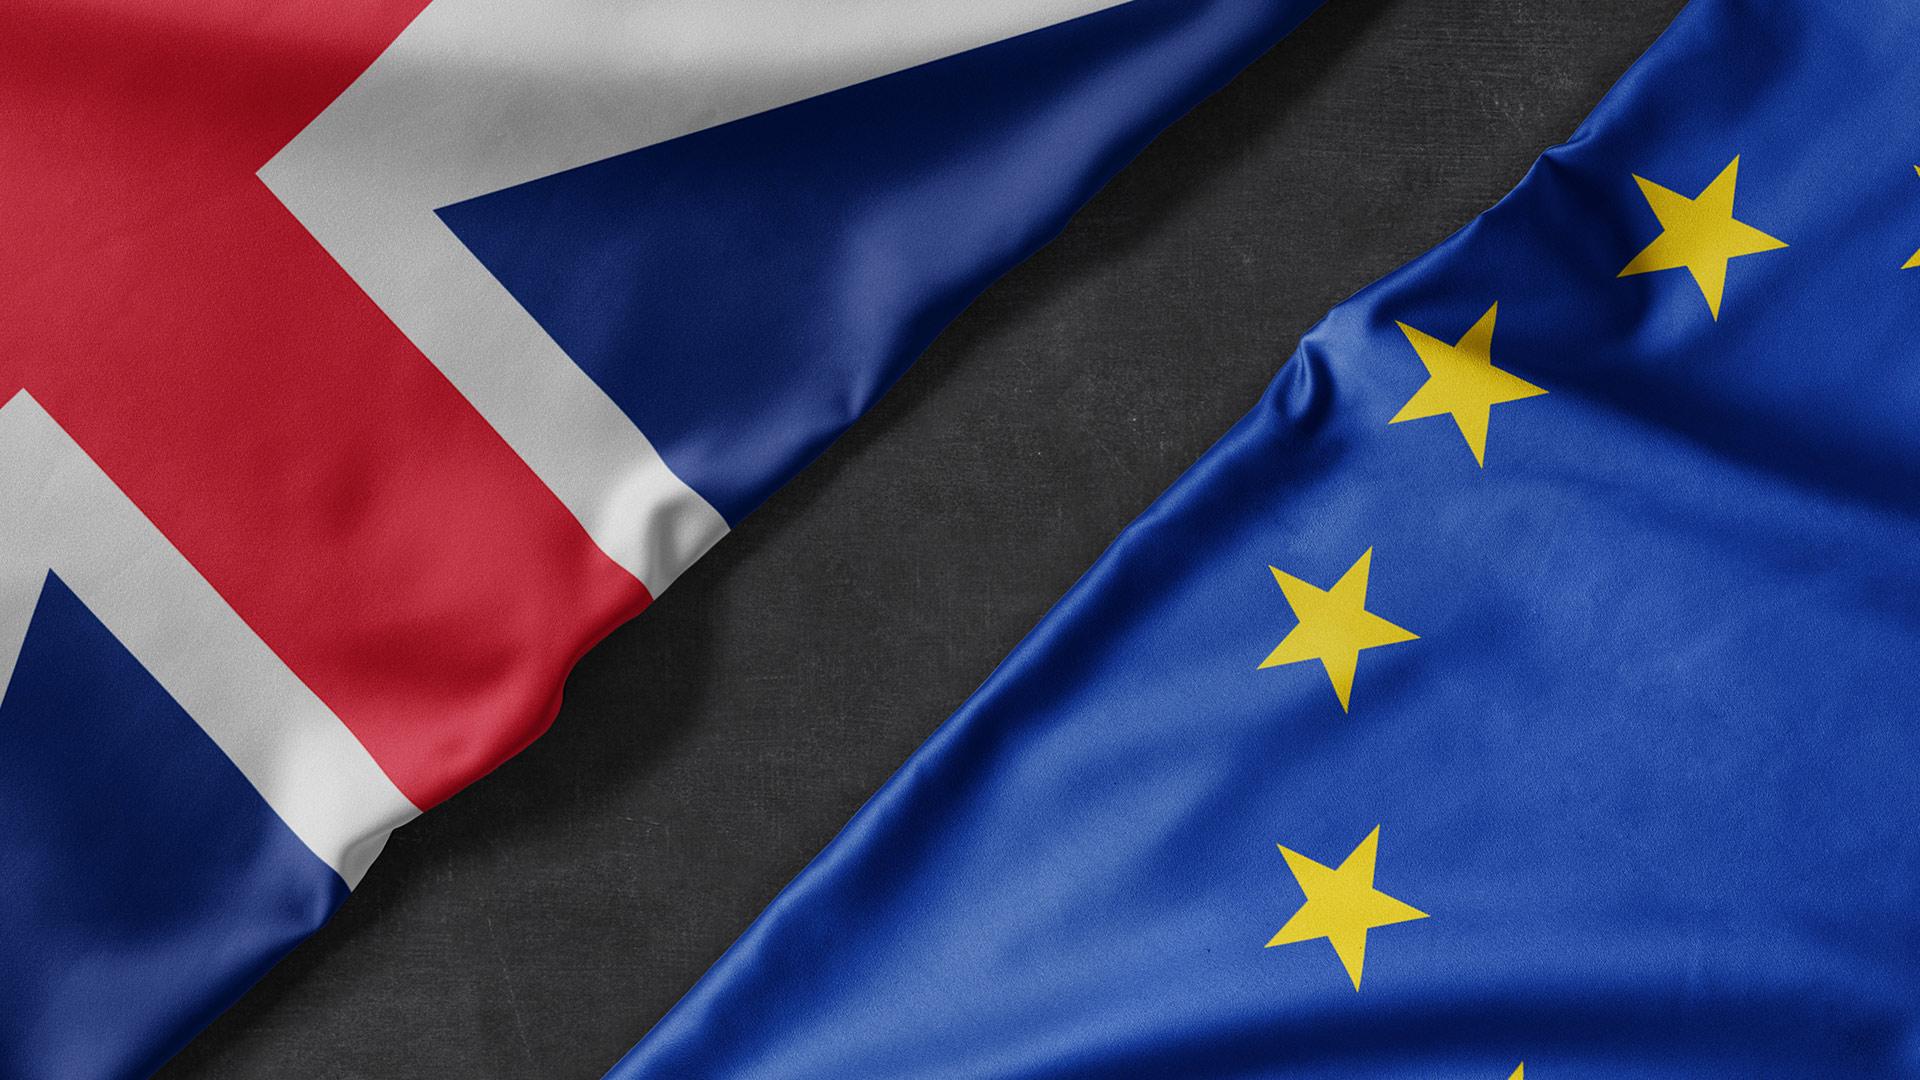 Brexit - UK and EU flag splitting